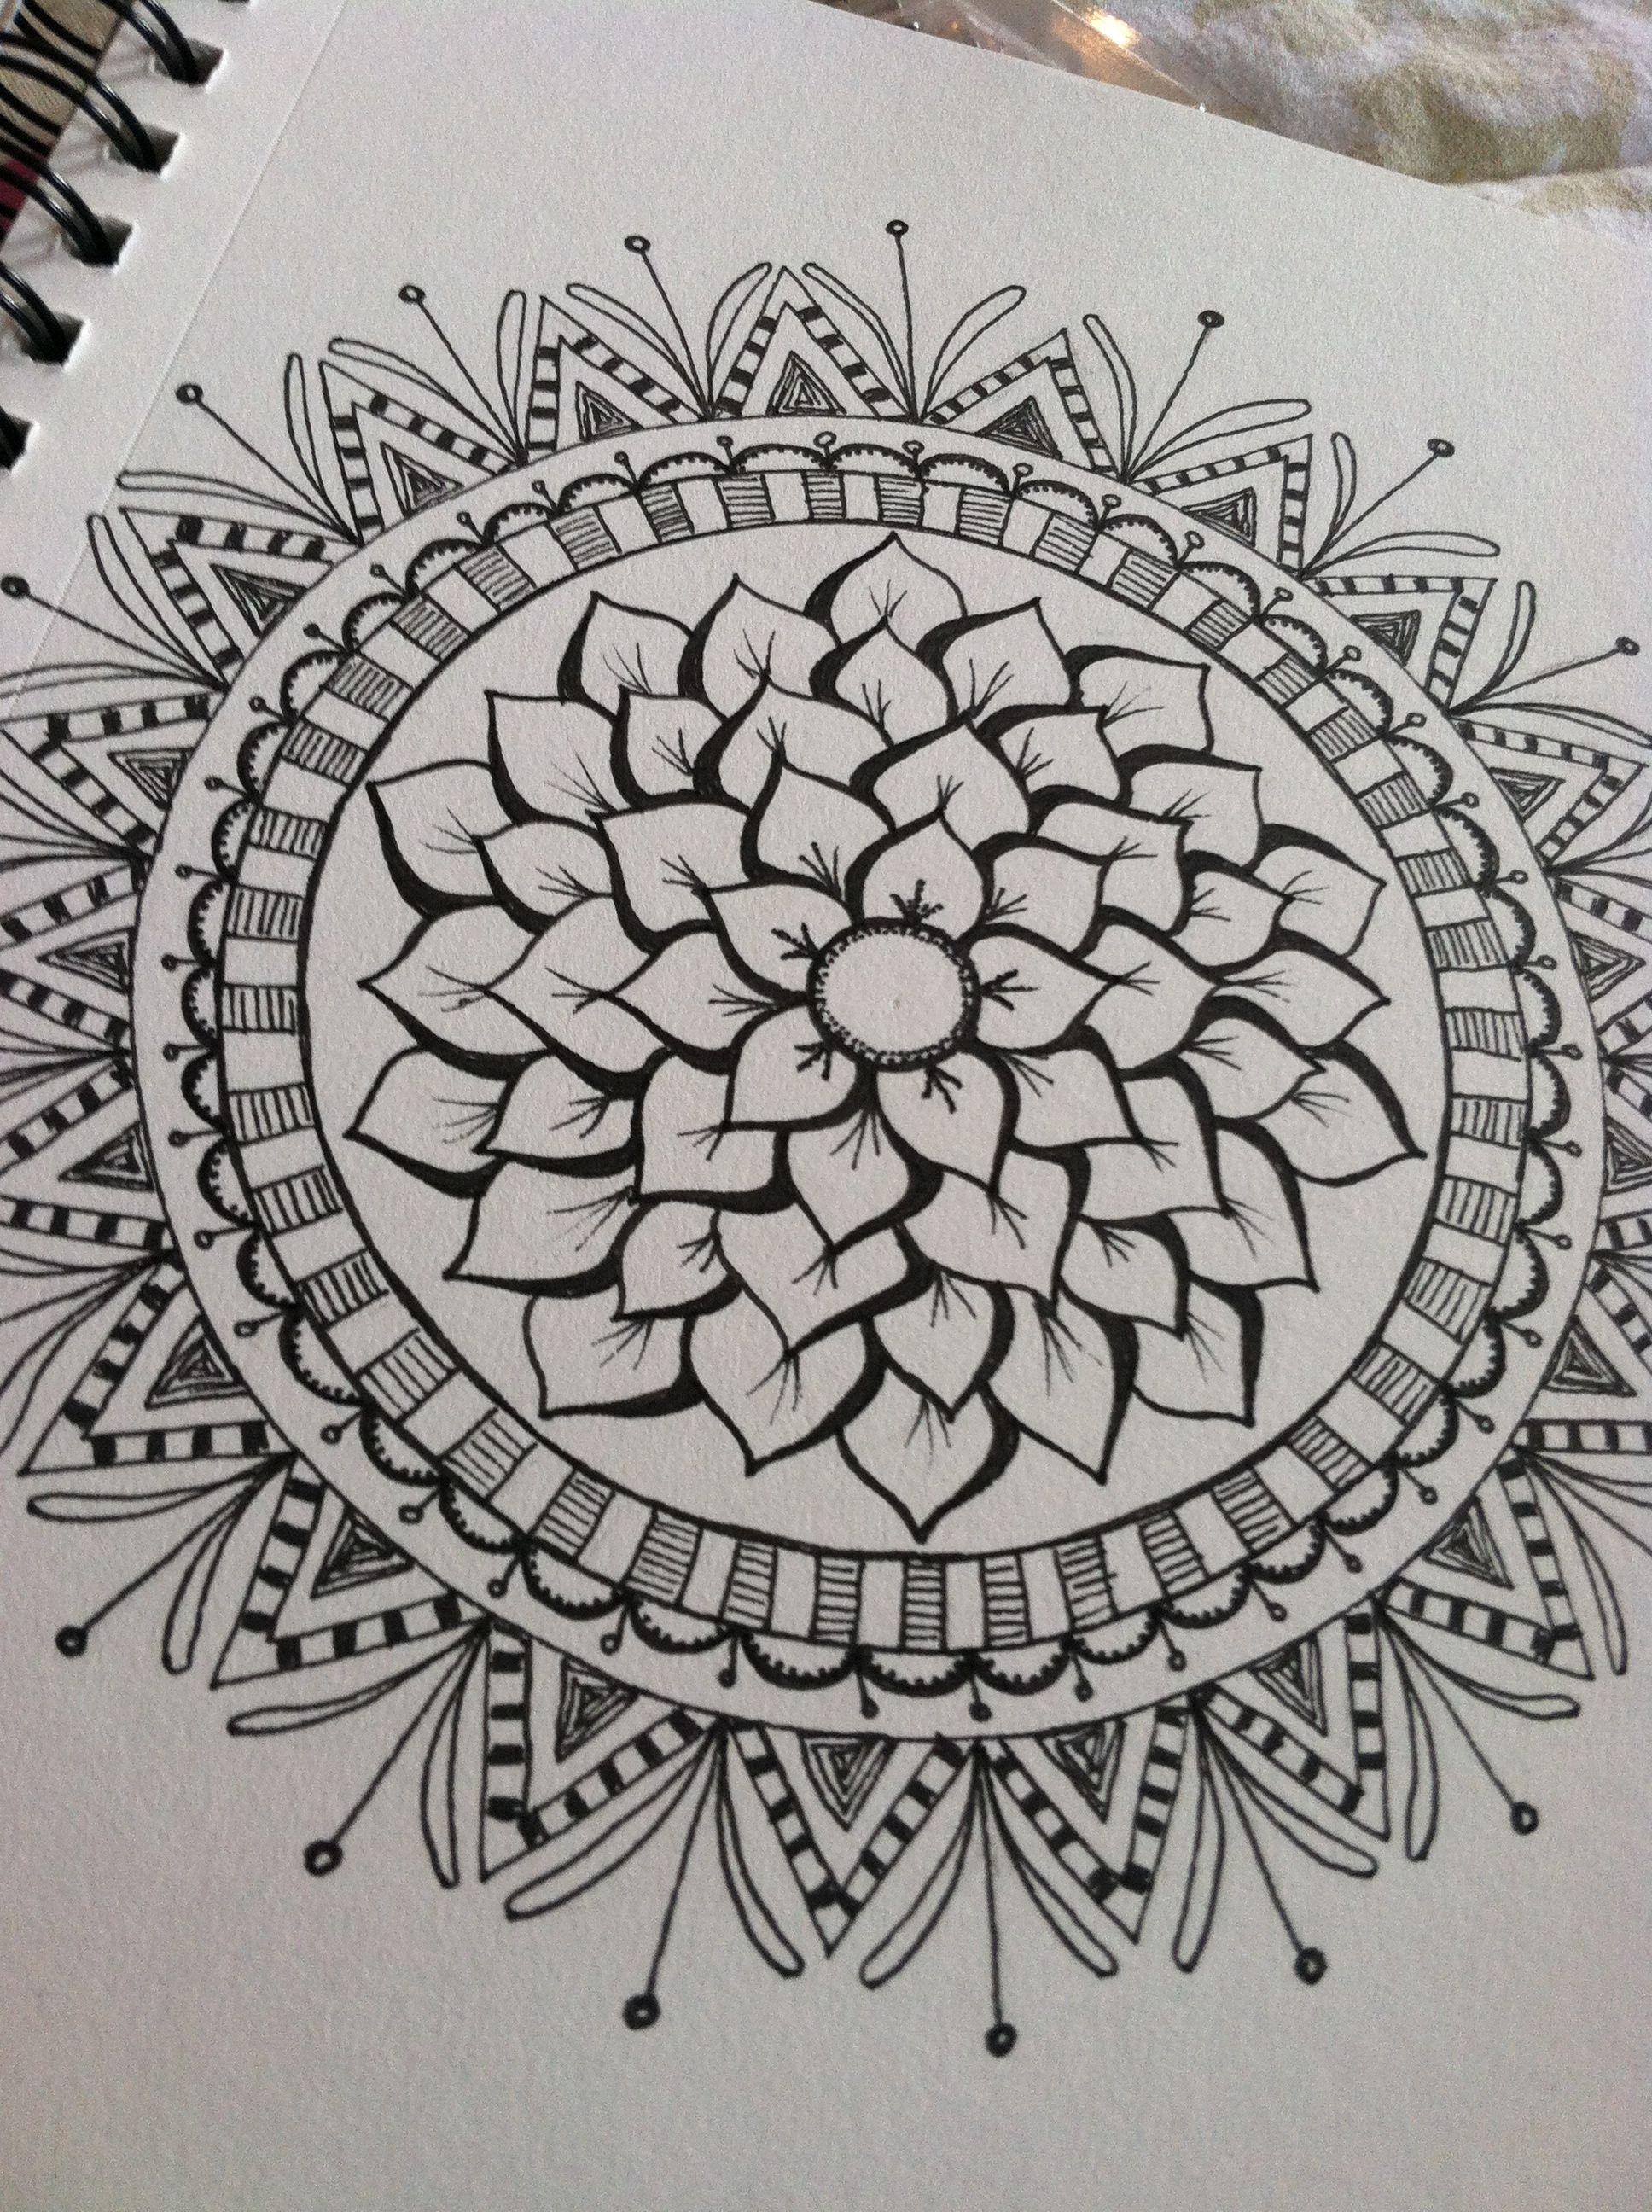 Embellished Flower Beintattoo Bunt Zentangle